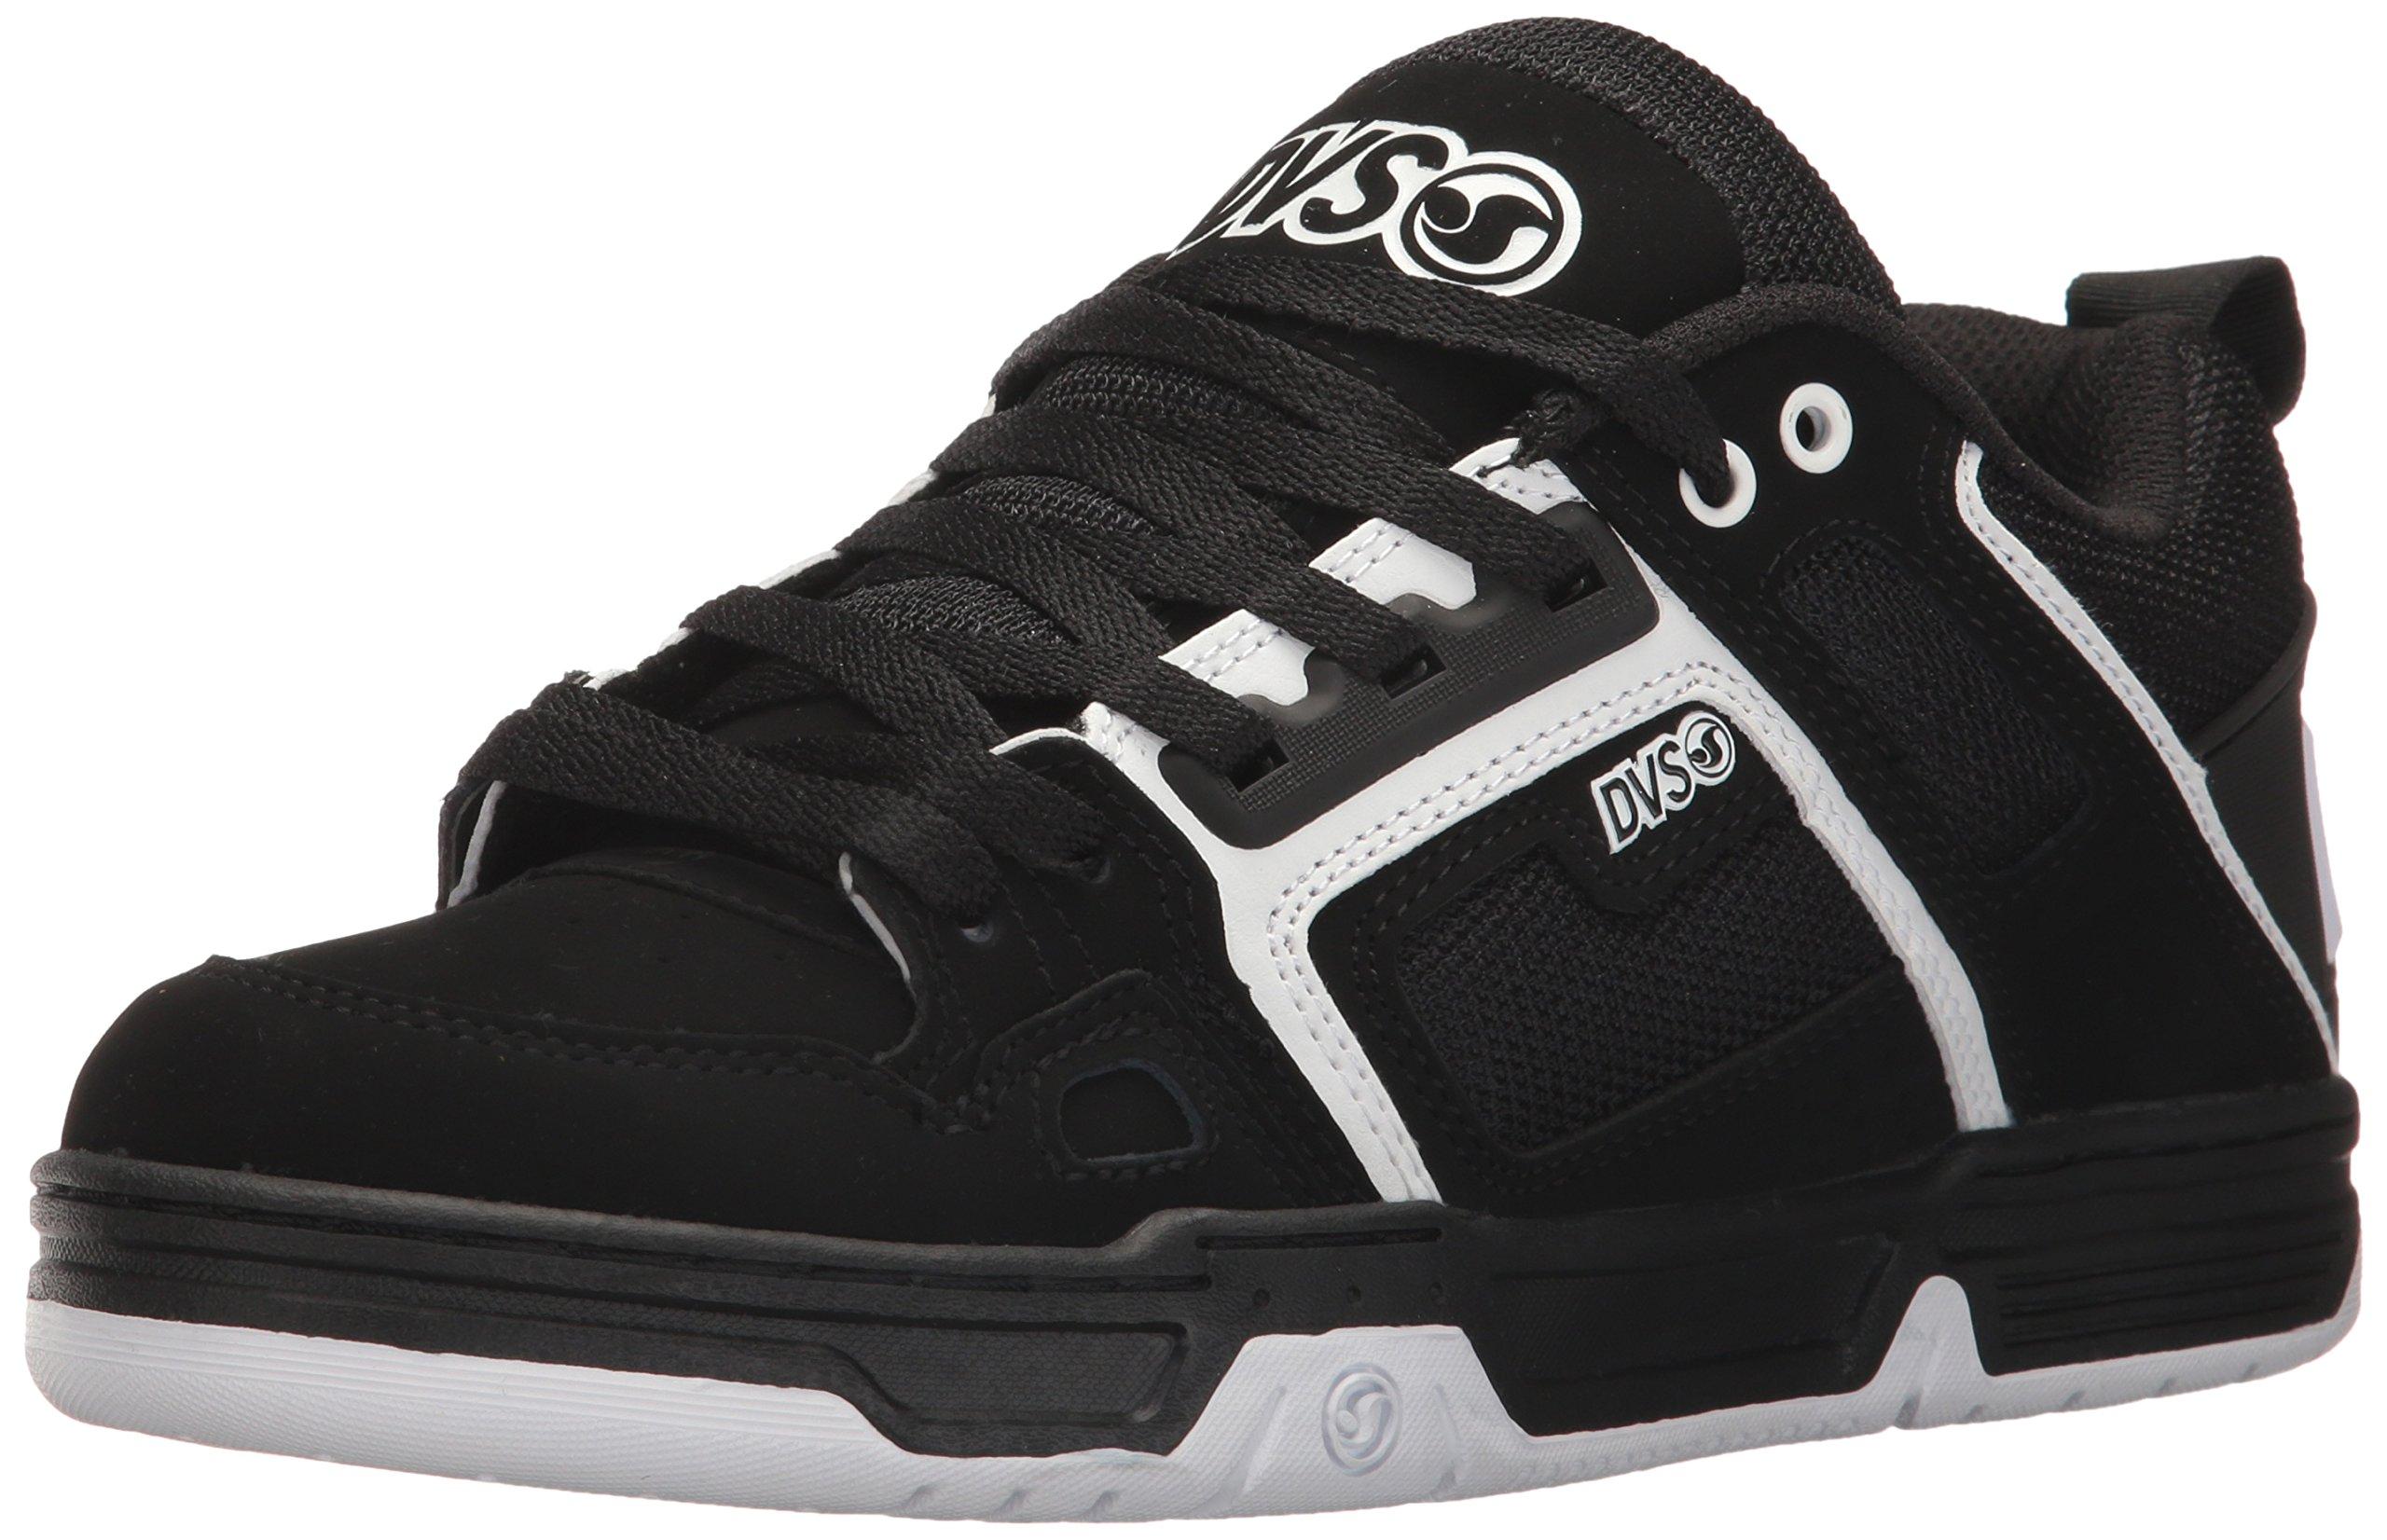 DVS Men's Comanche Skate Shoe, Black/White Nubuck, 12 Medium US by DVS (Image #1)